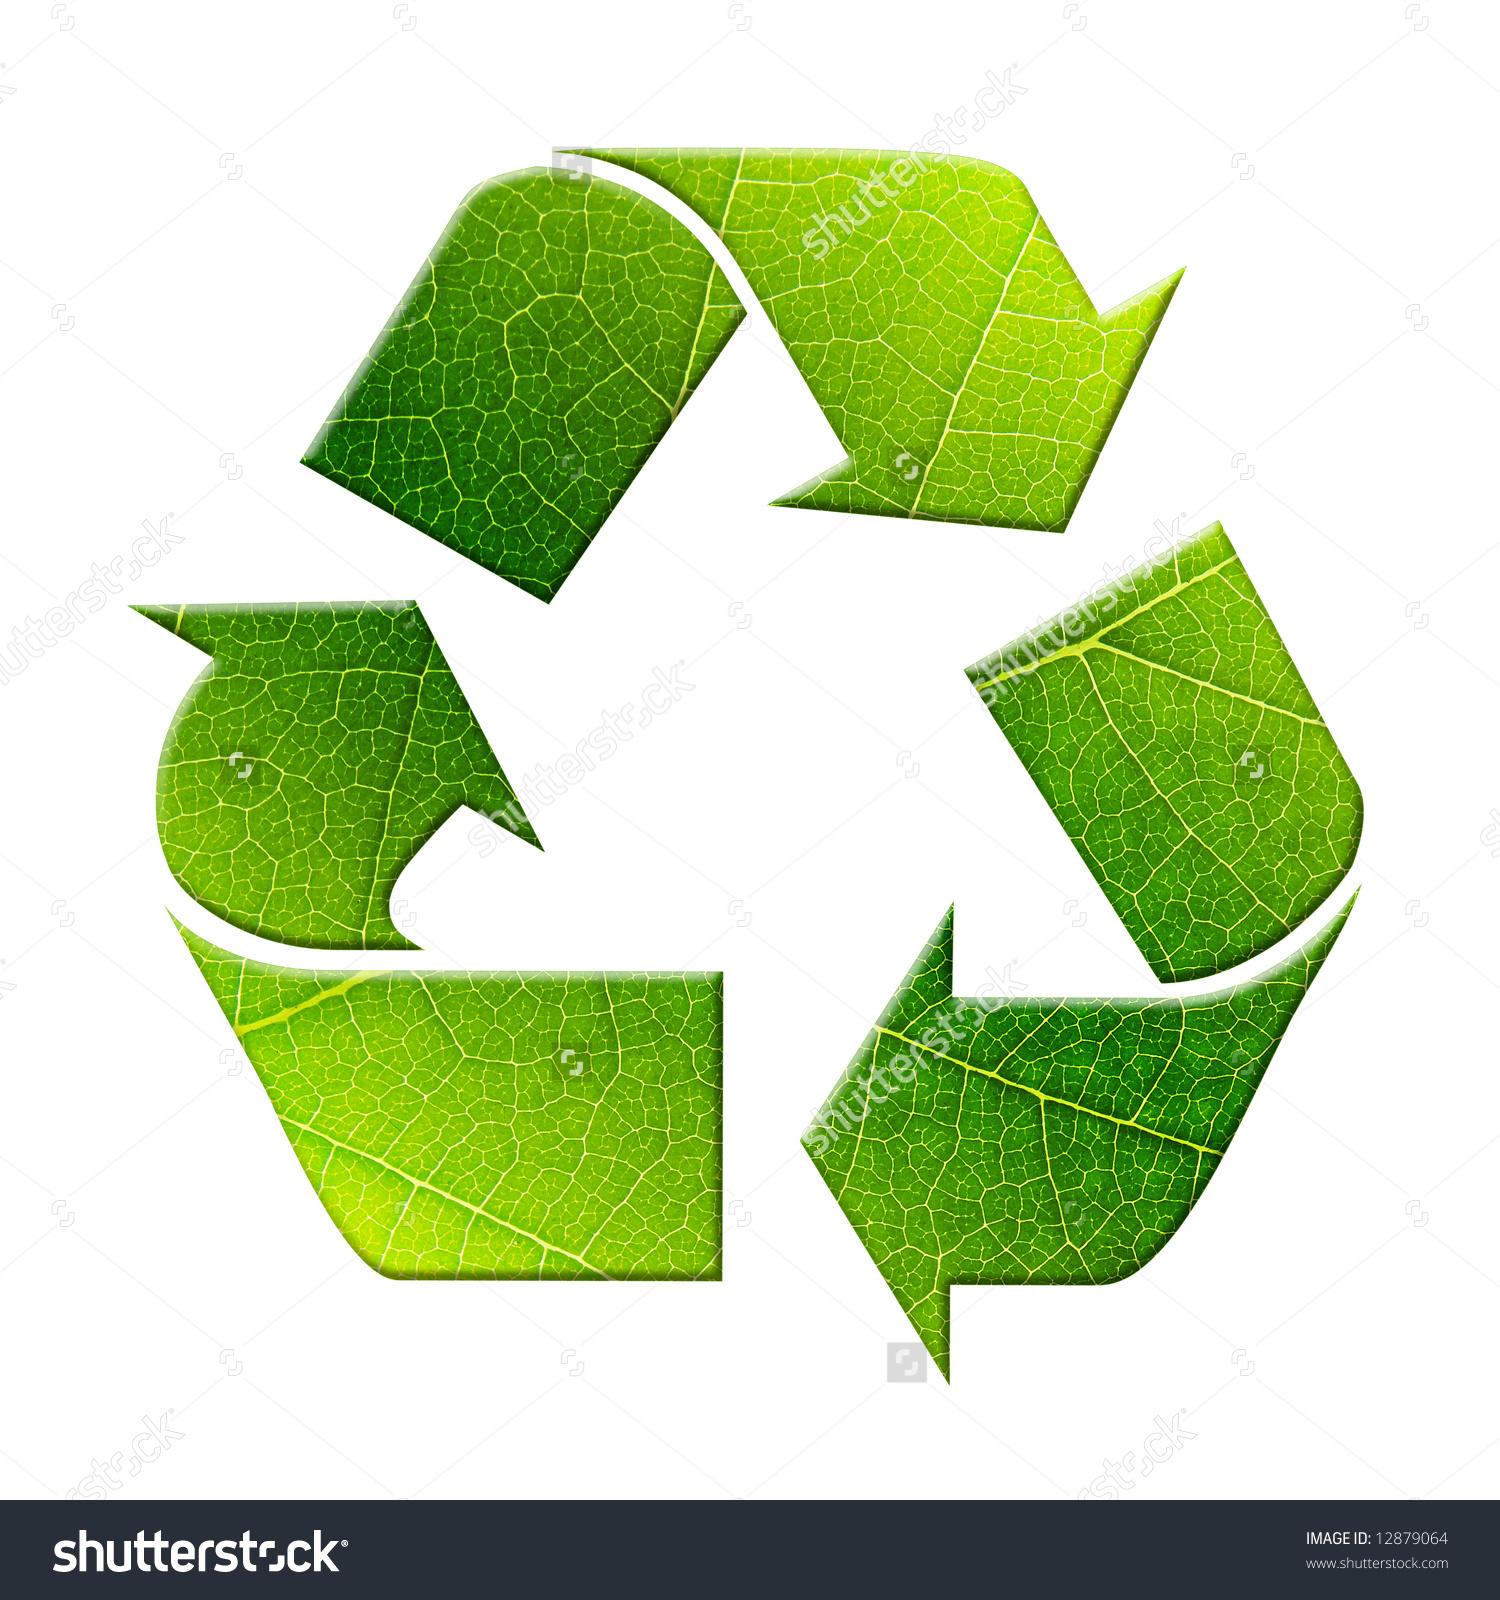 Green Three Arrow Recycling Symbol Superimposed Stock Photo.